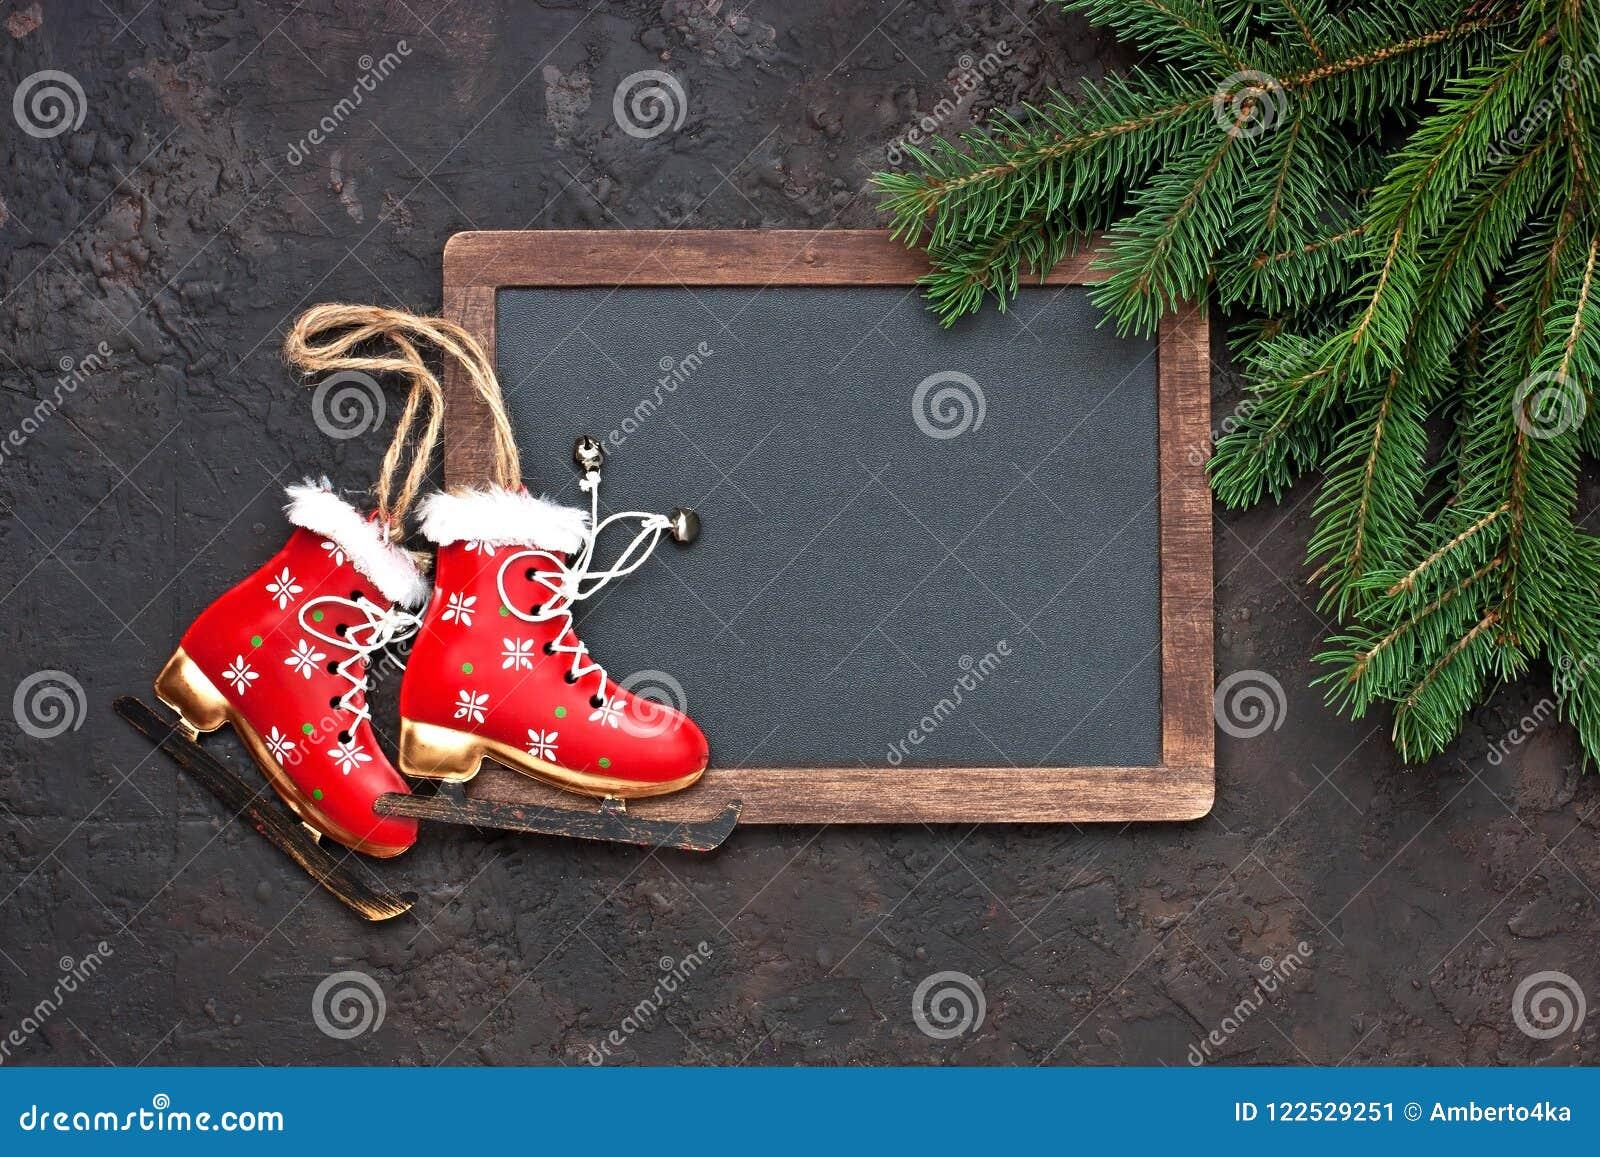 Christmas Still Life With Bright Symbols Stock Image Image Of